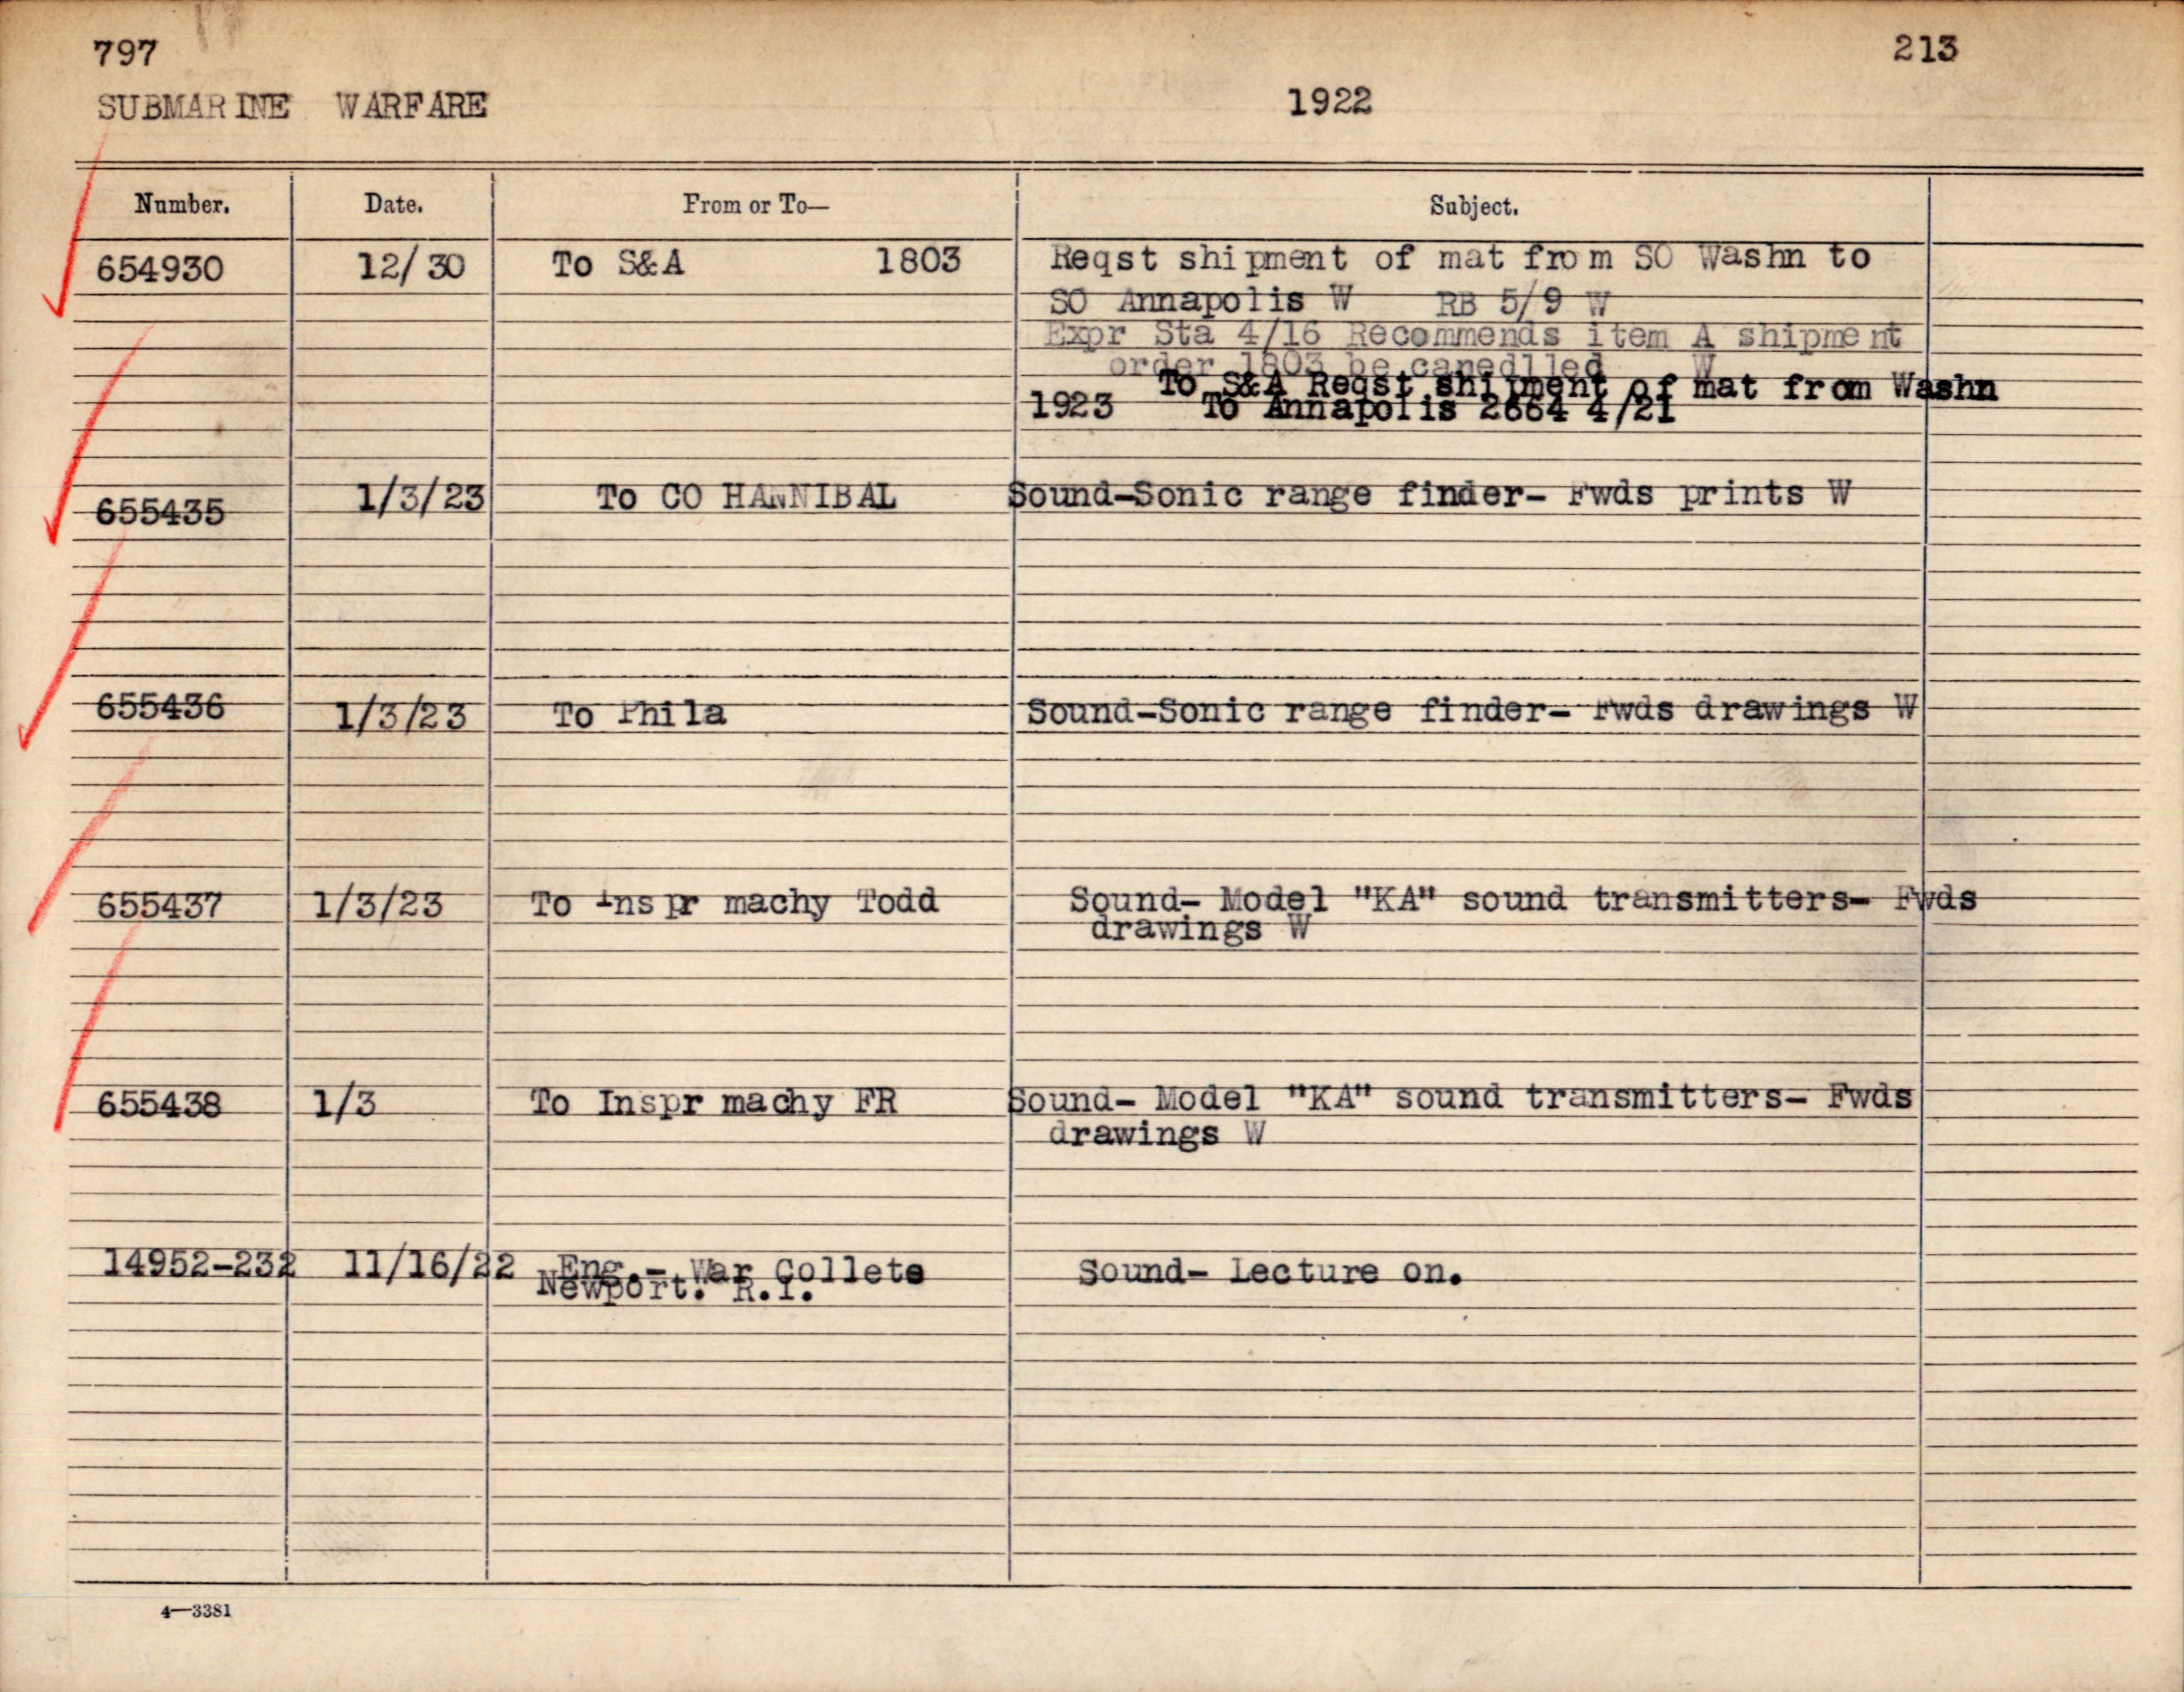 General Subject: 797 Submarine Warfare